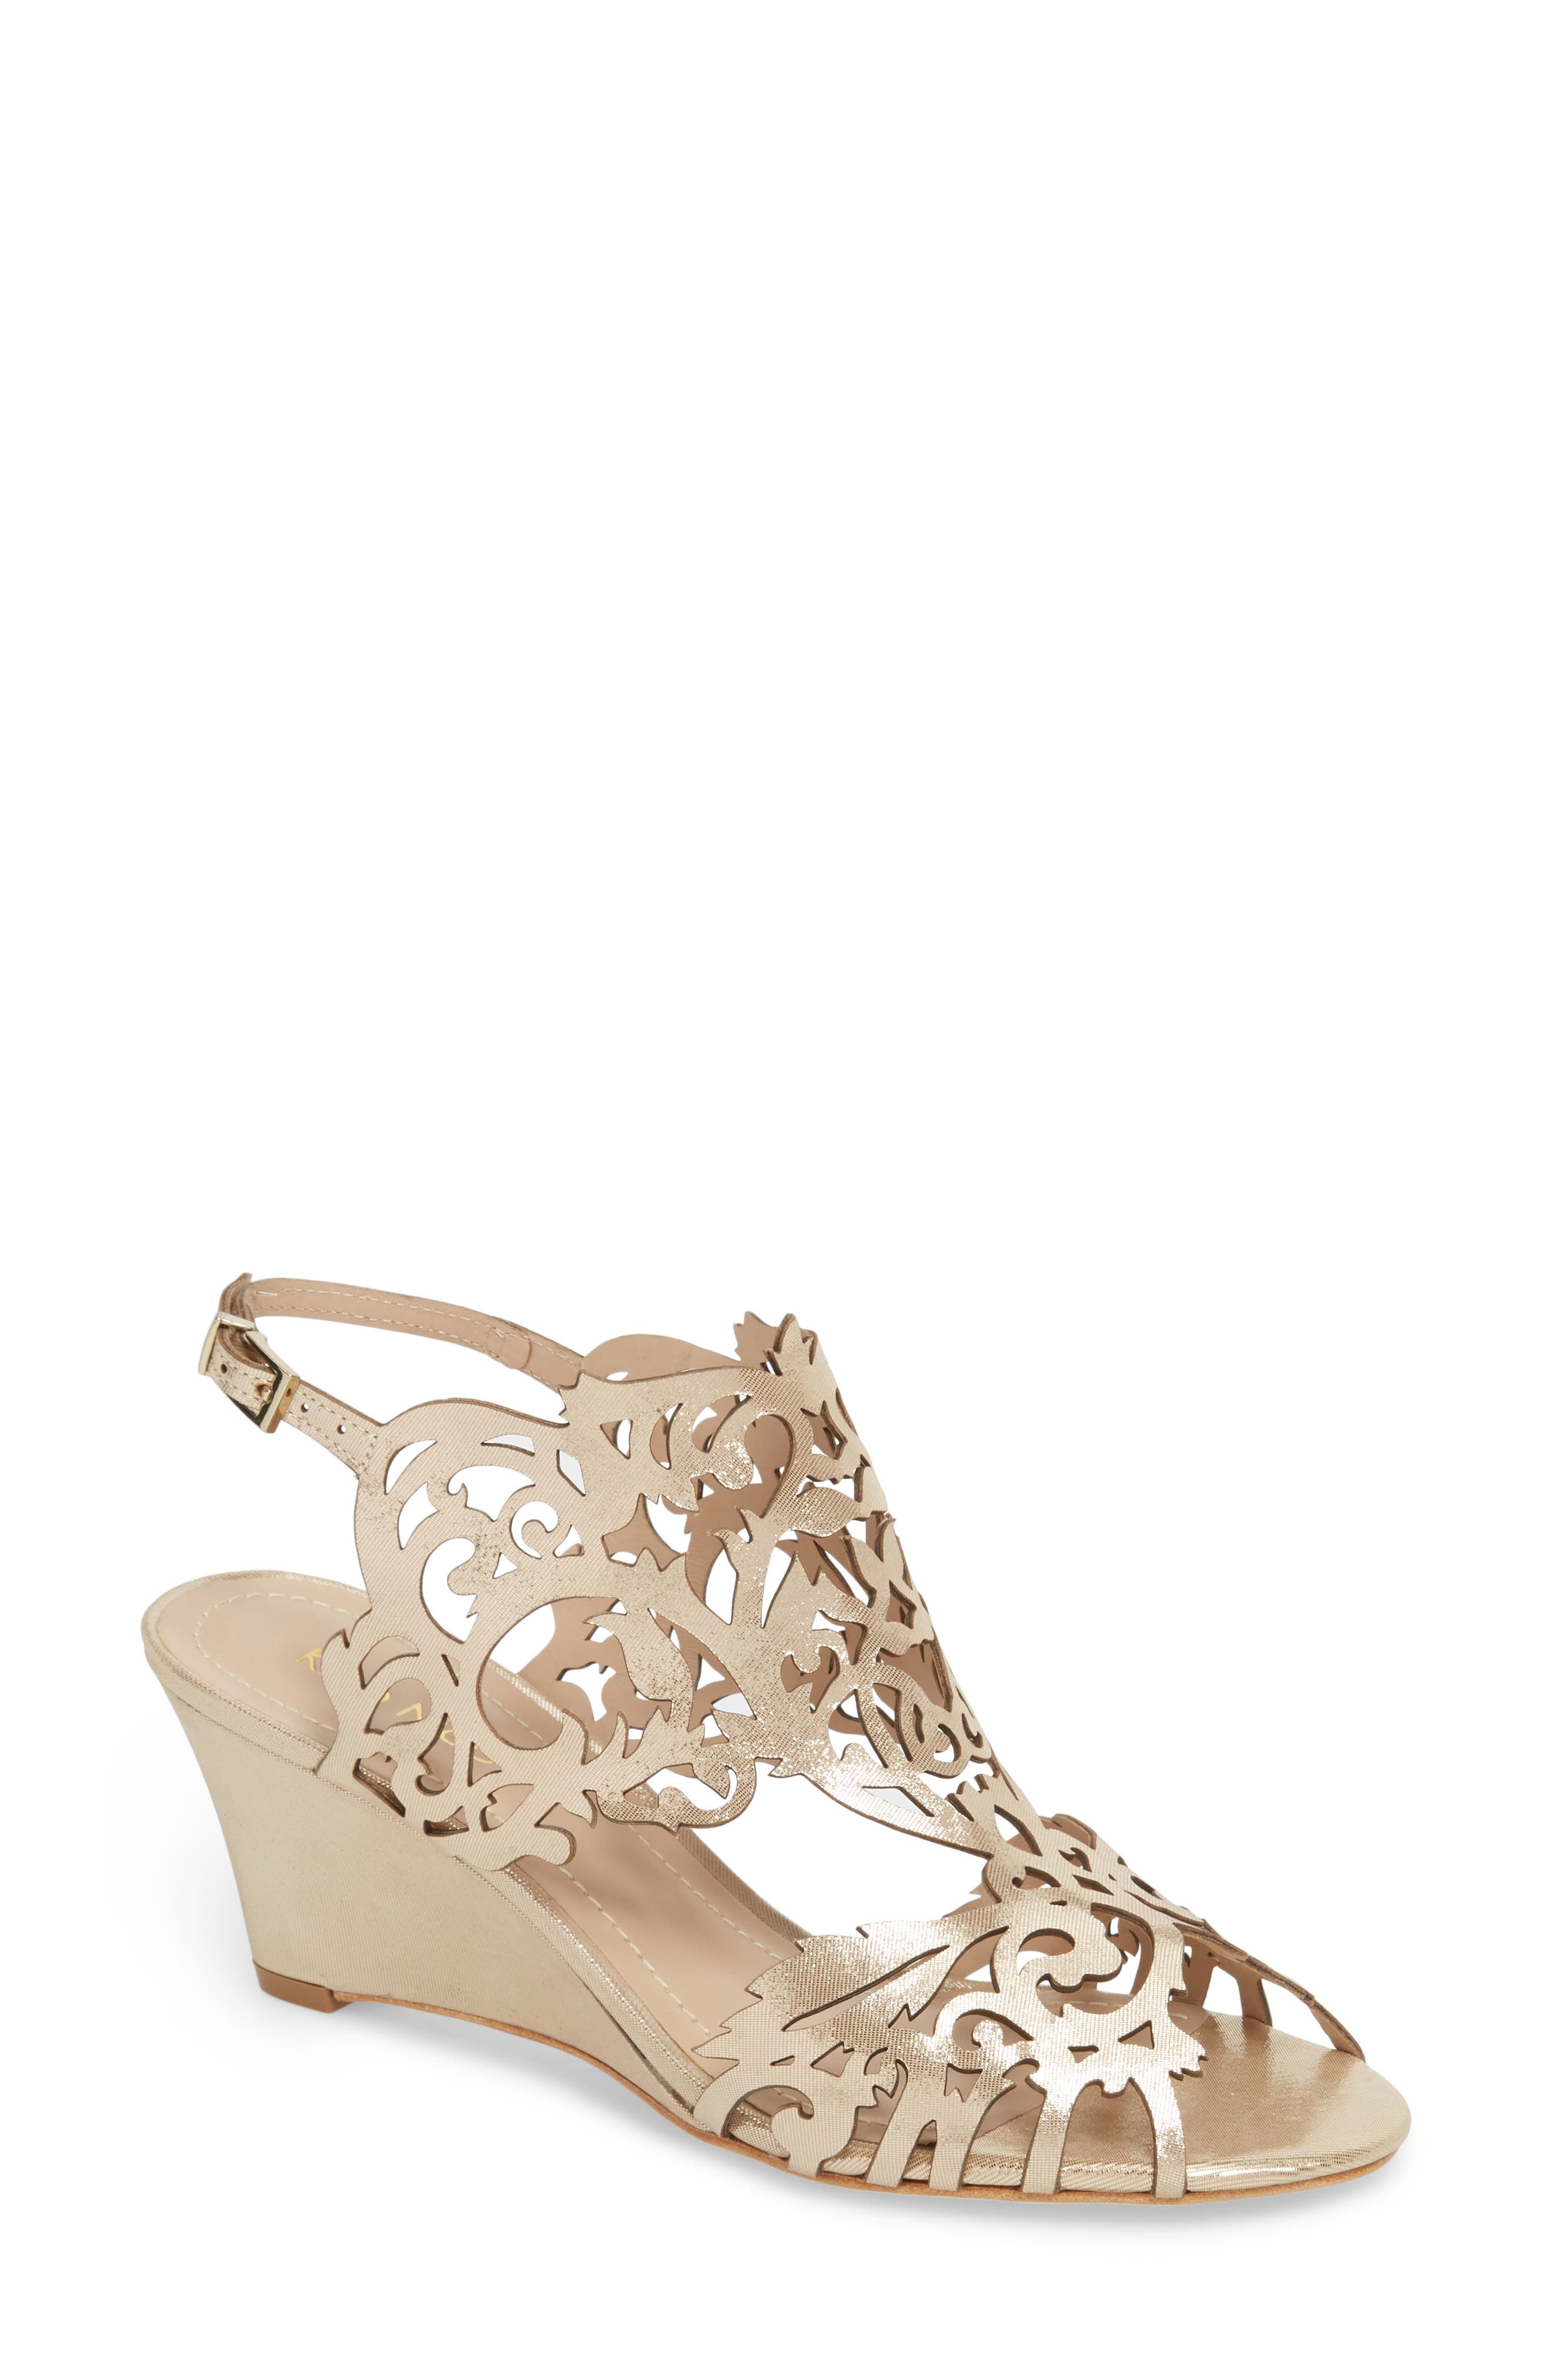 41e08f90fa8 Women s Wedding Guest Wedge Sandals